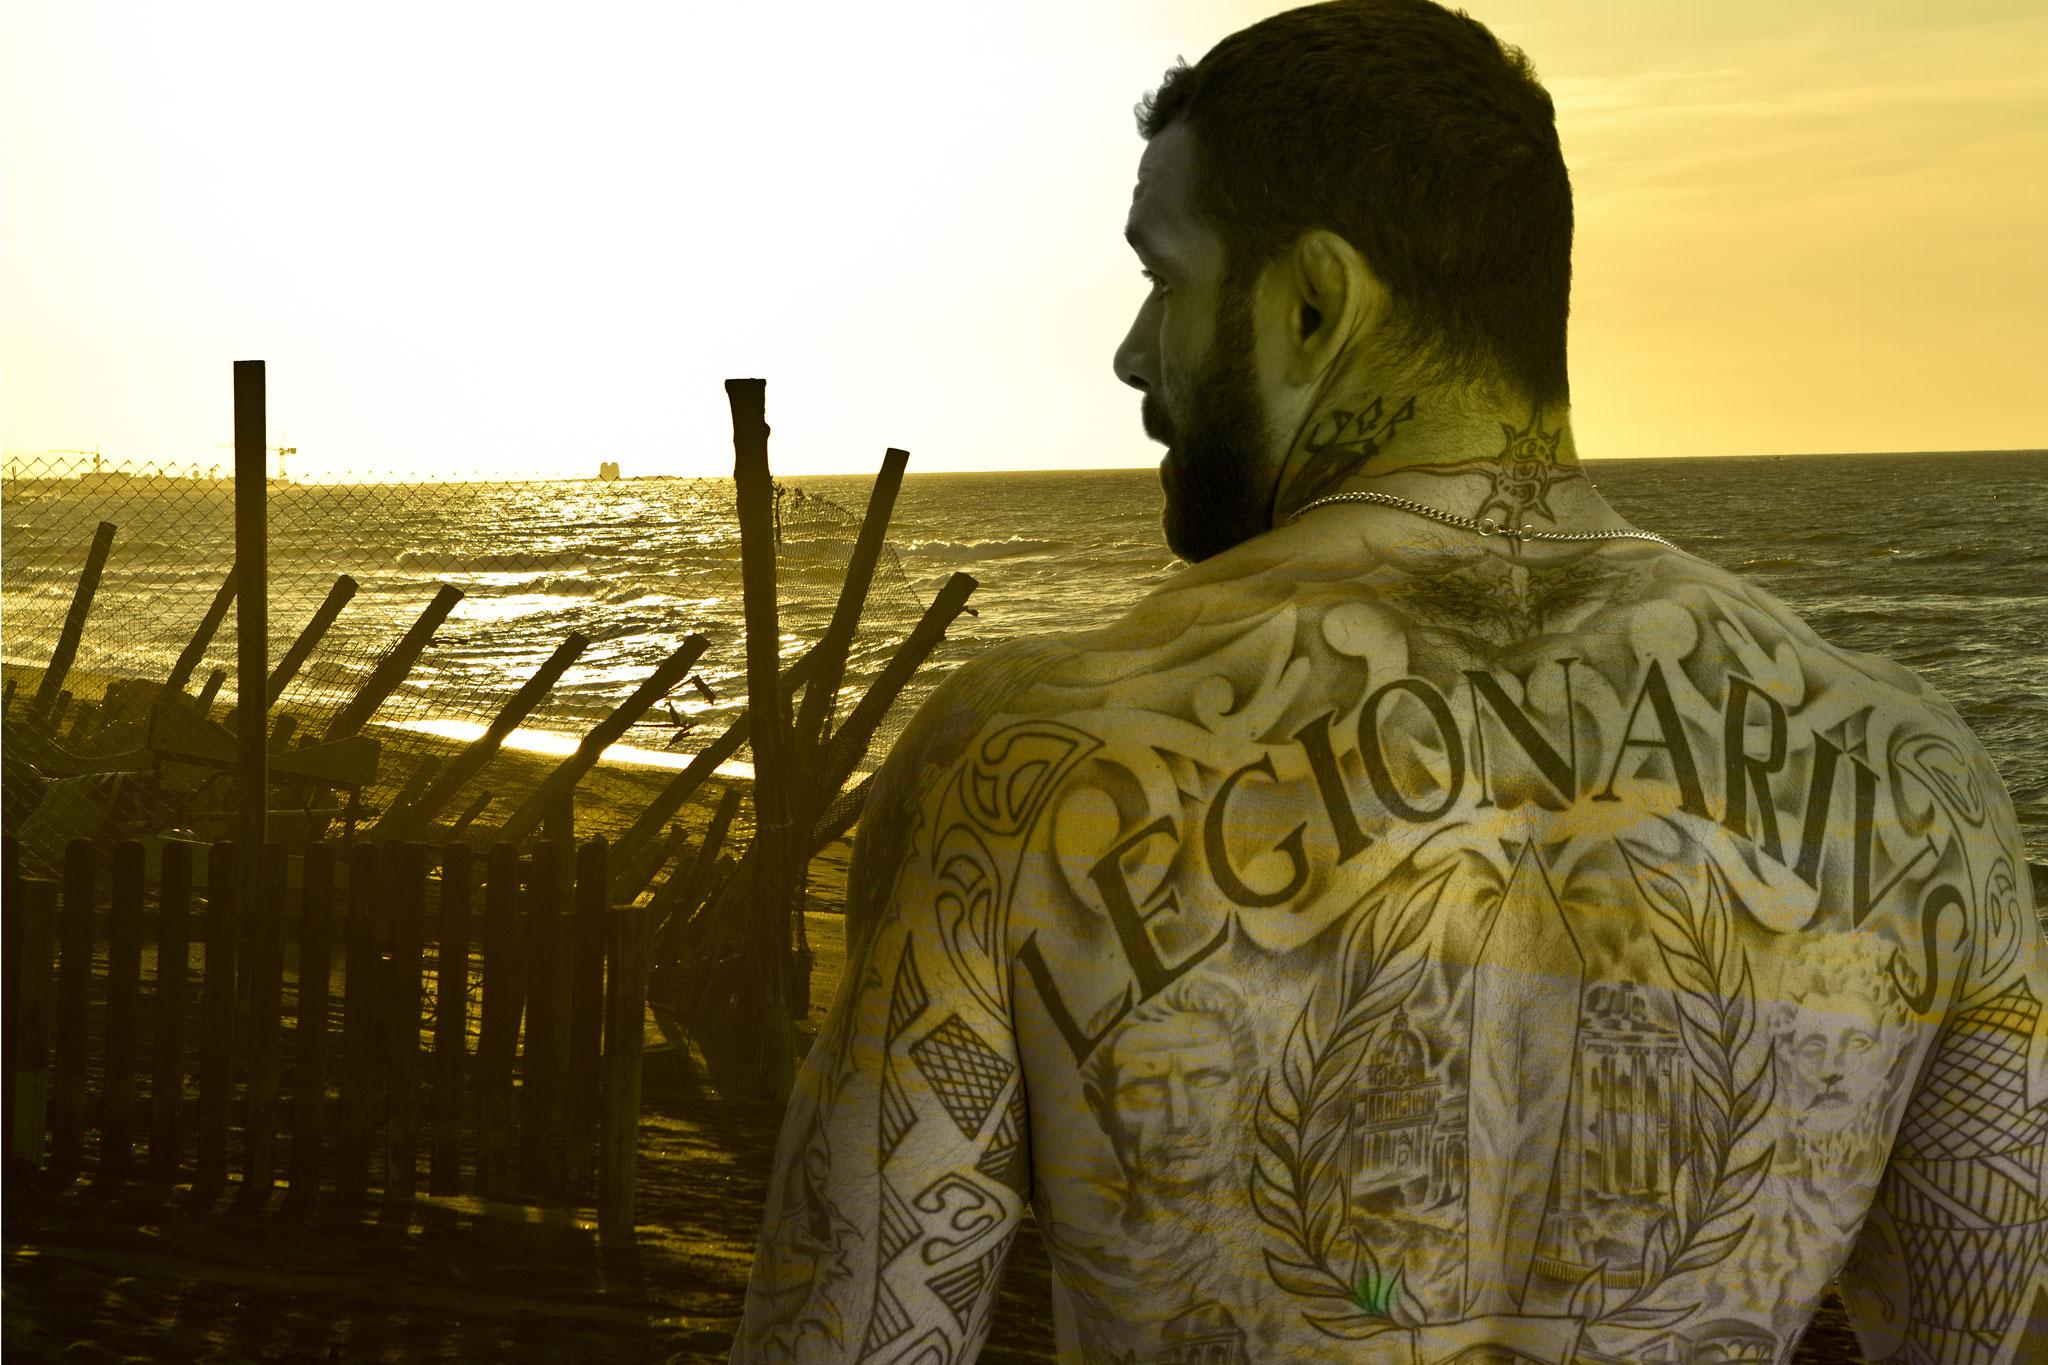 Alessio Sakara - MMA UFC FFC - Artista marziale  | All rights reserved|